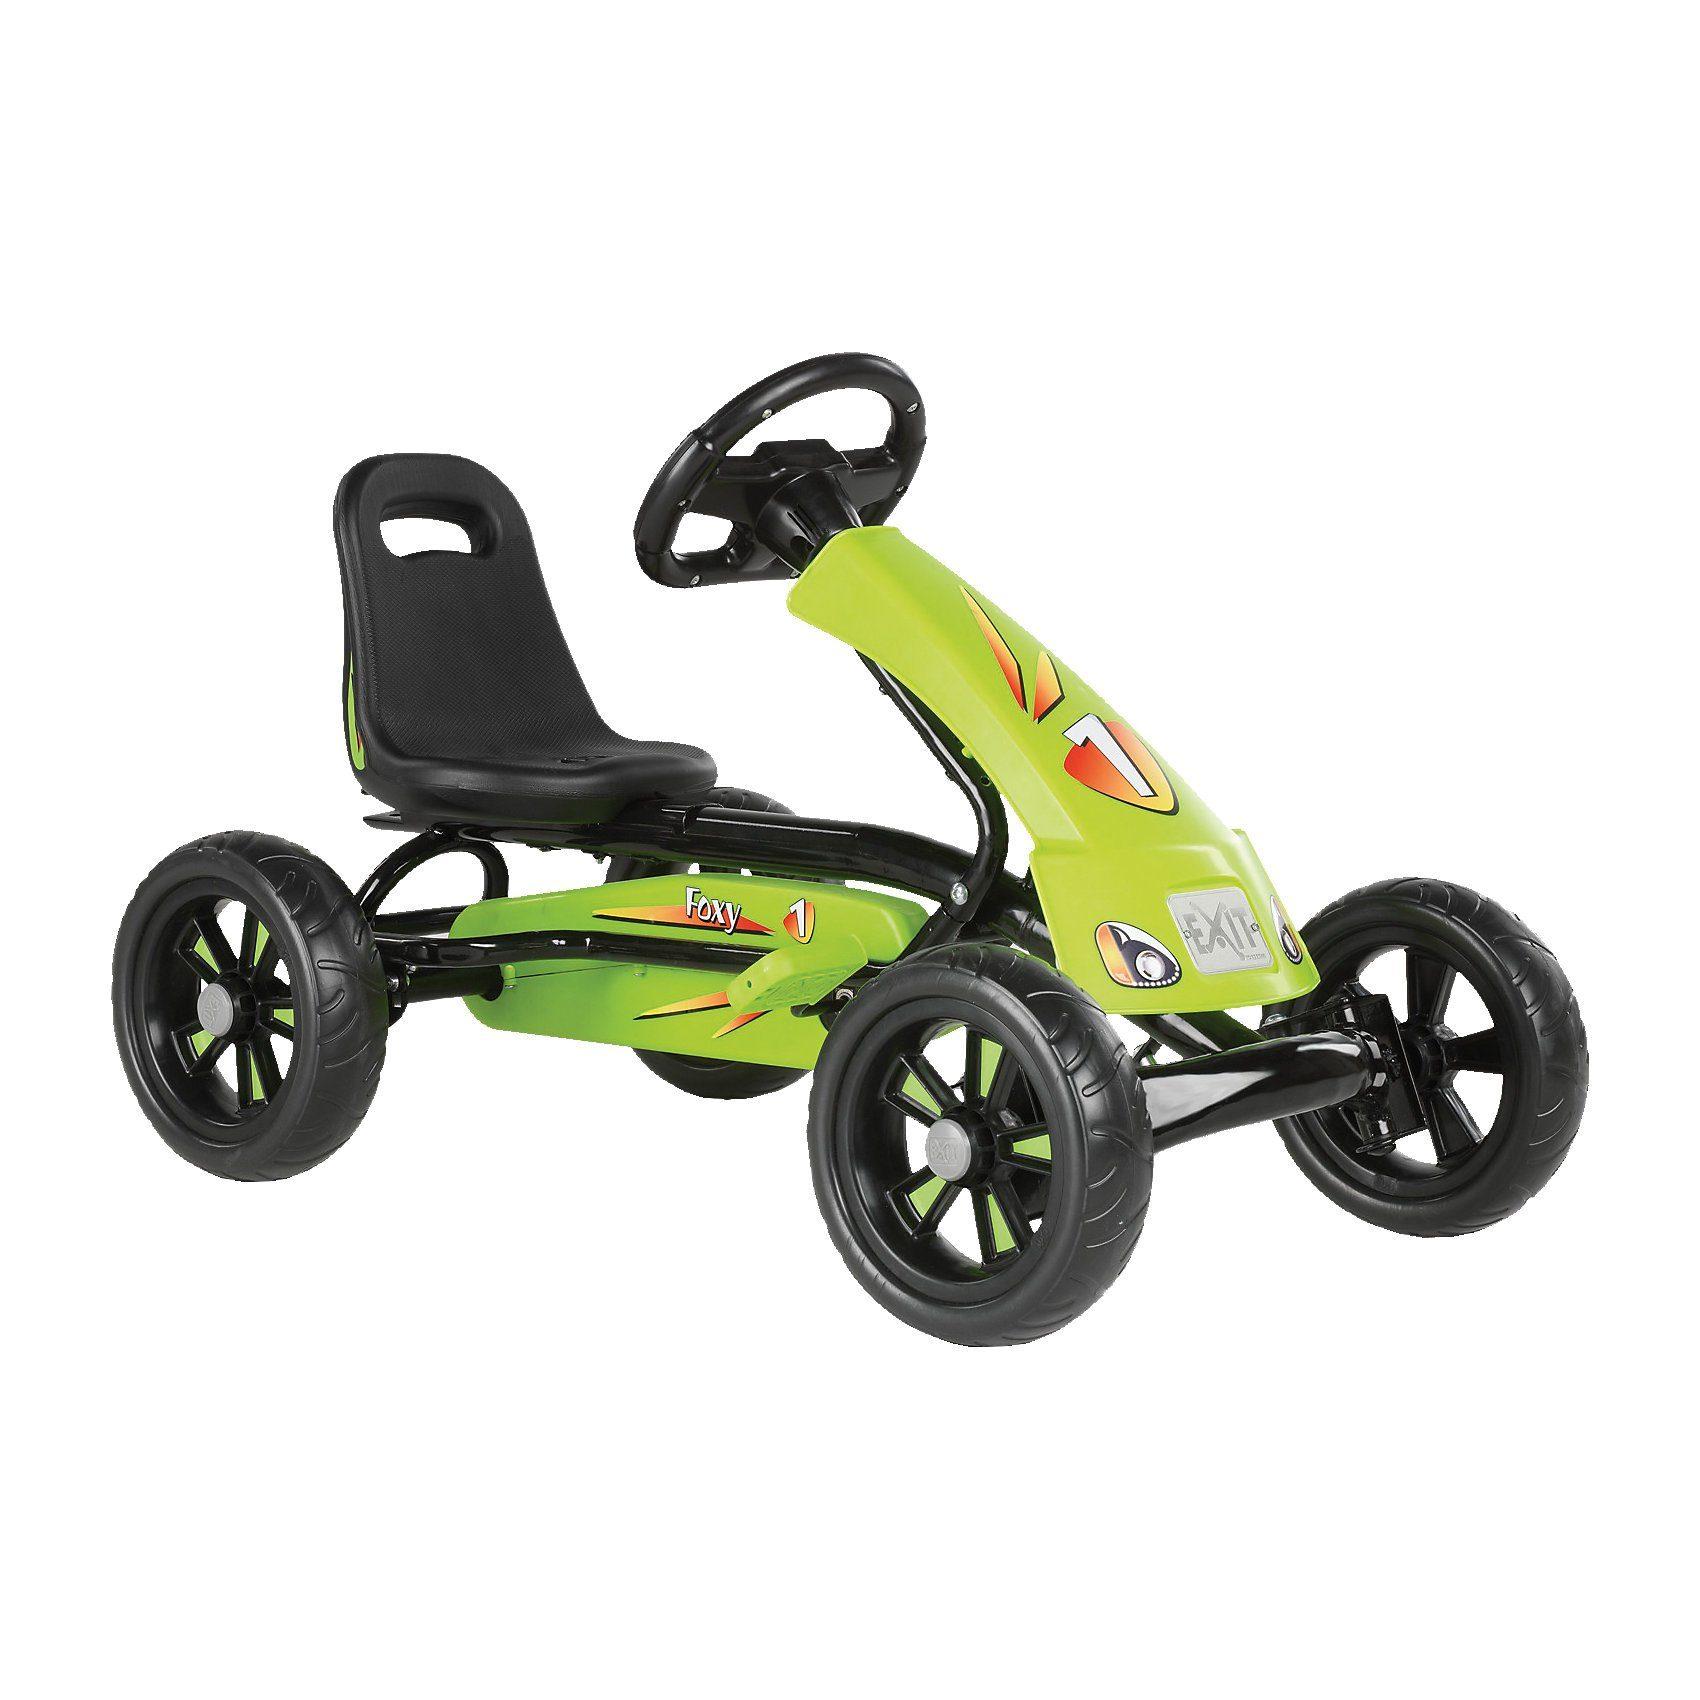 EXIT Go-Kart Foxy